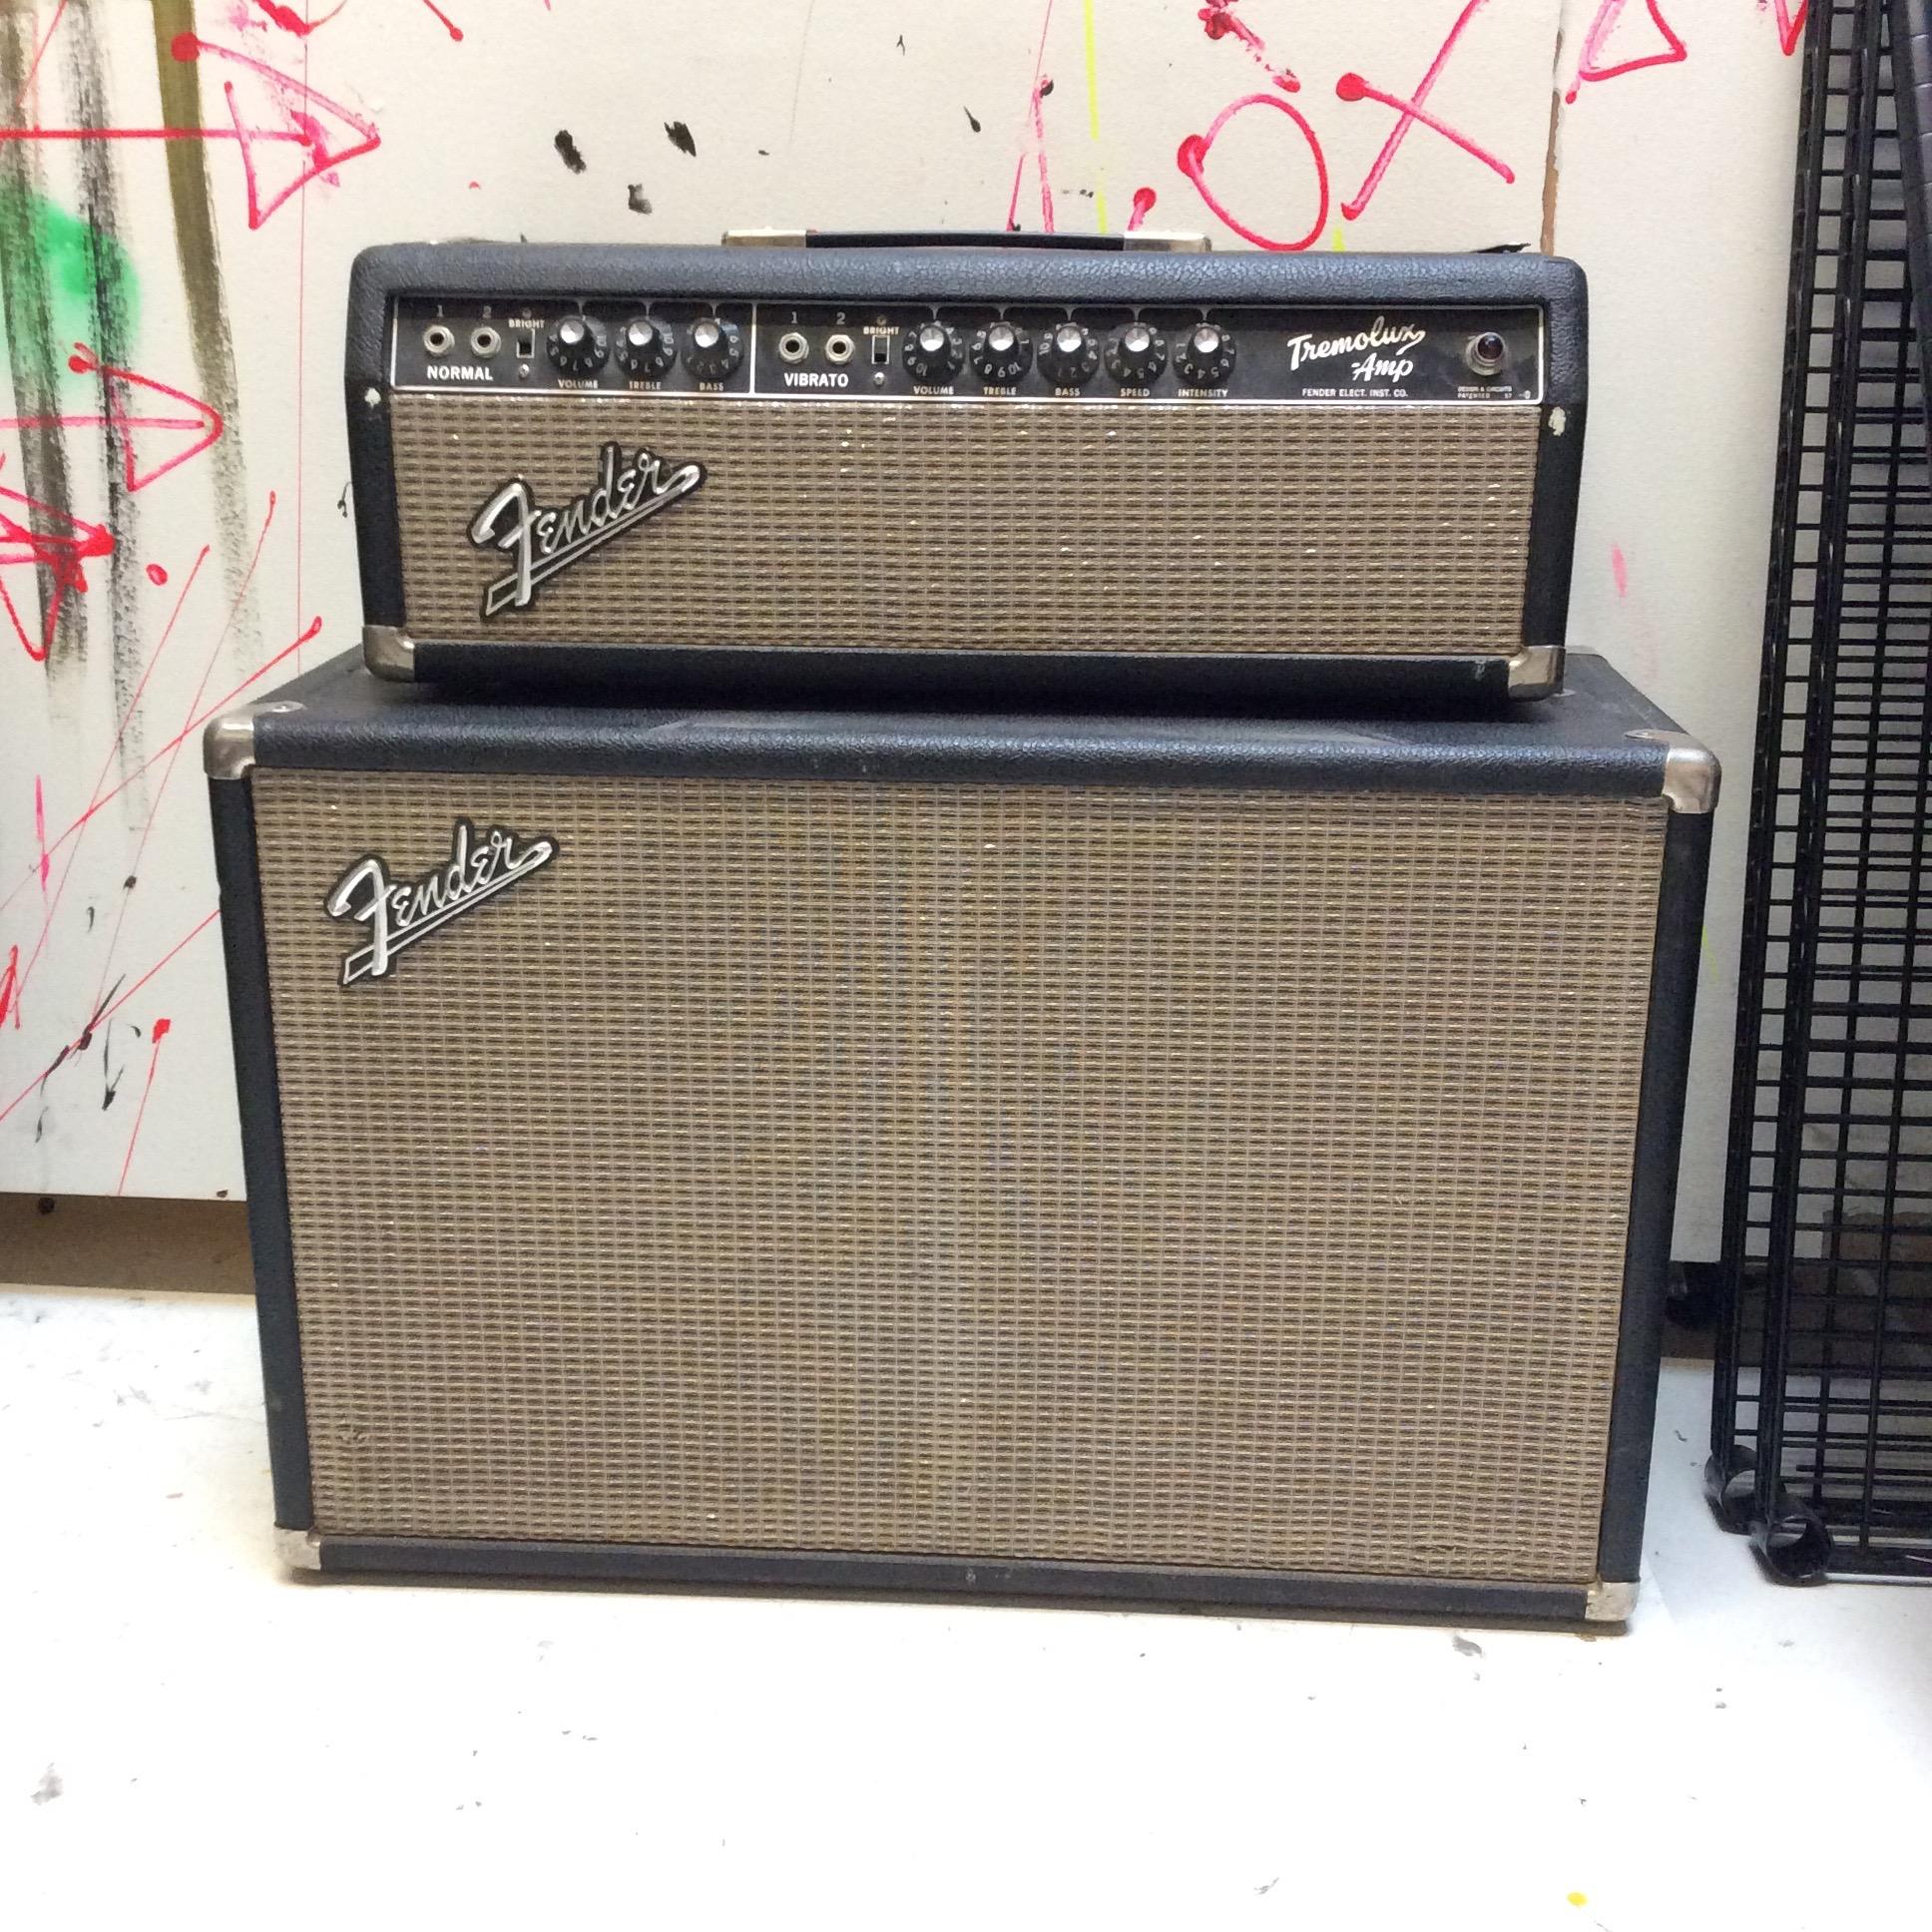 Fender Tremolux Amp Head (Top)  Notes: